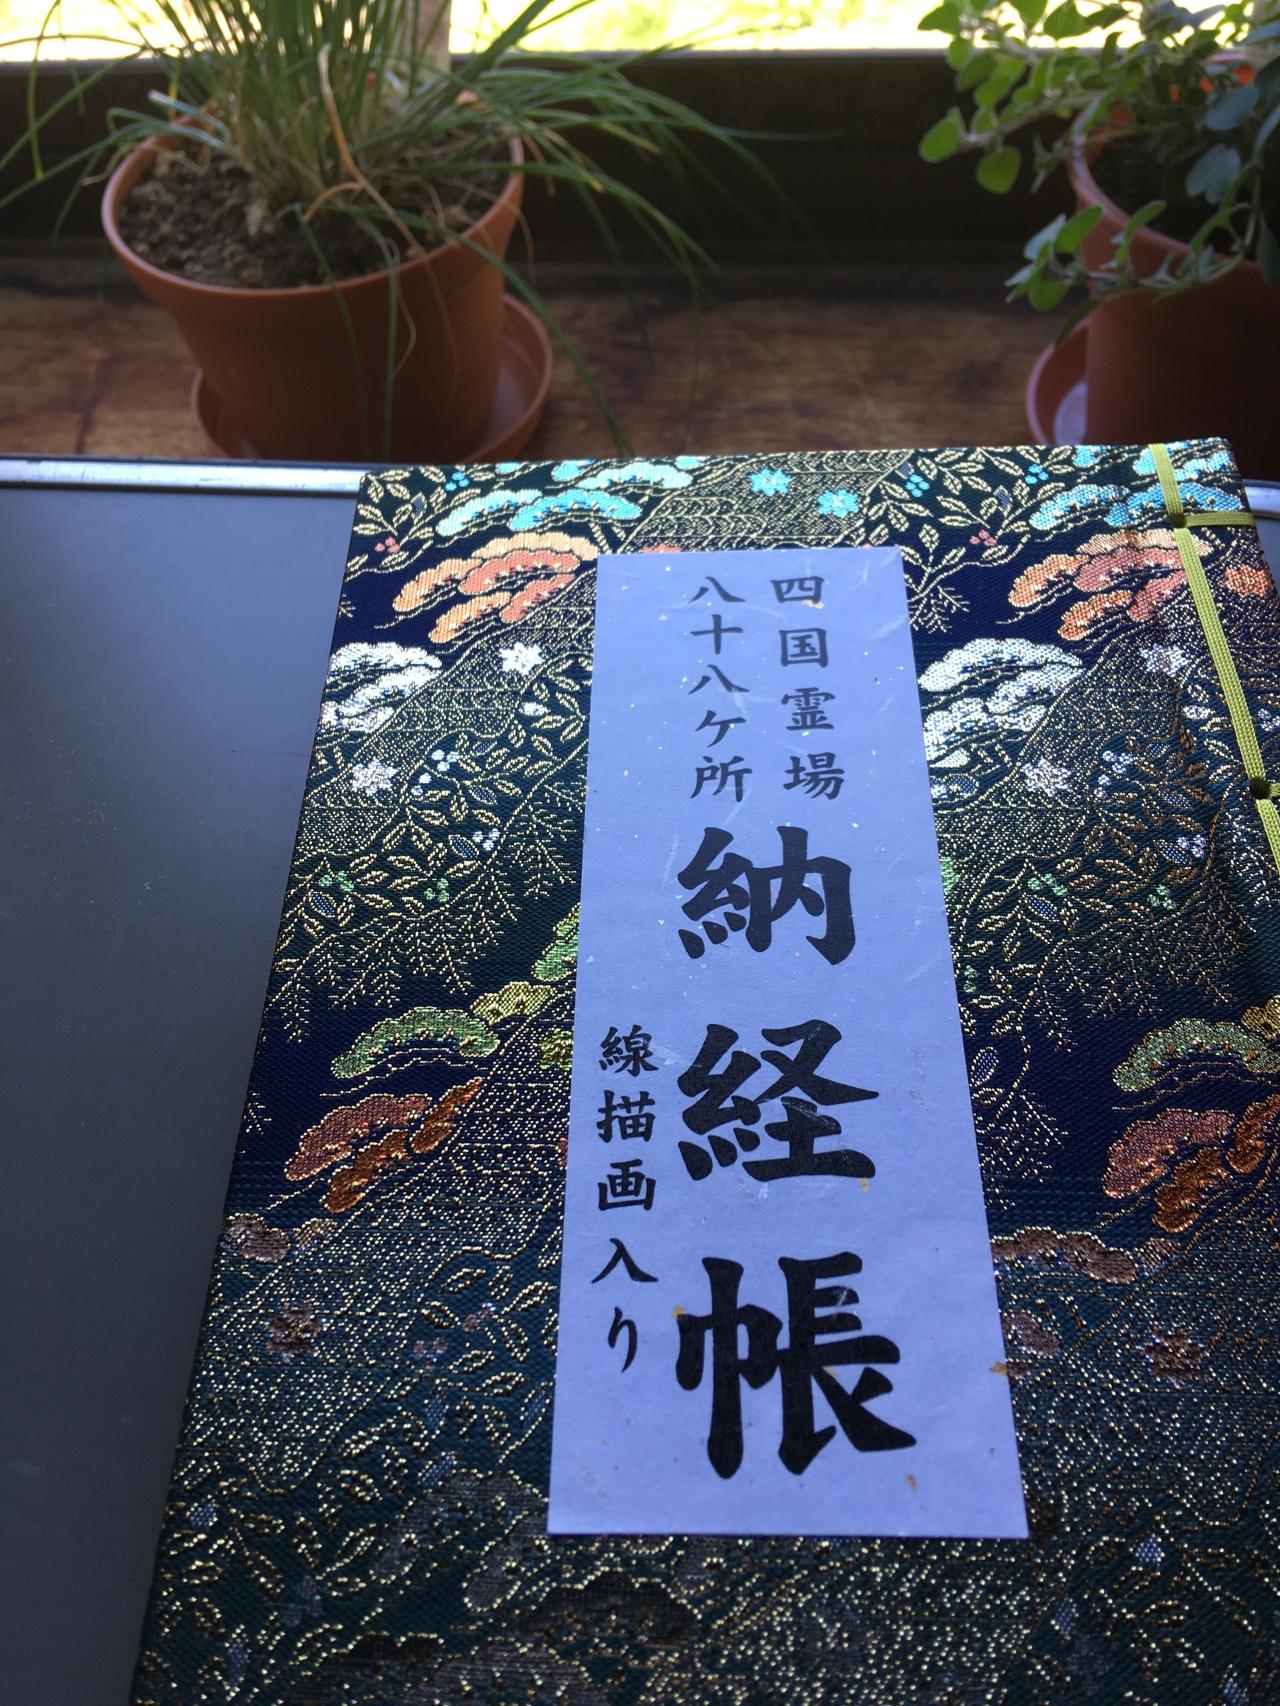 Shikoku's 88 TemplePilgrimage